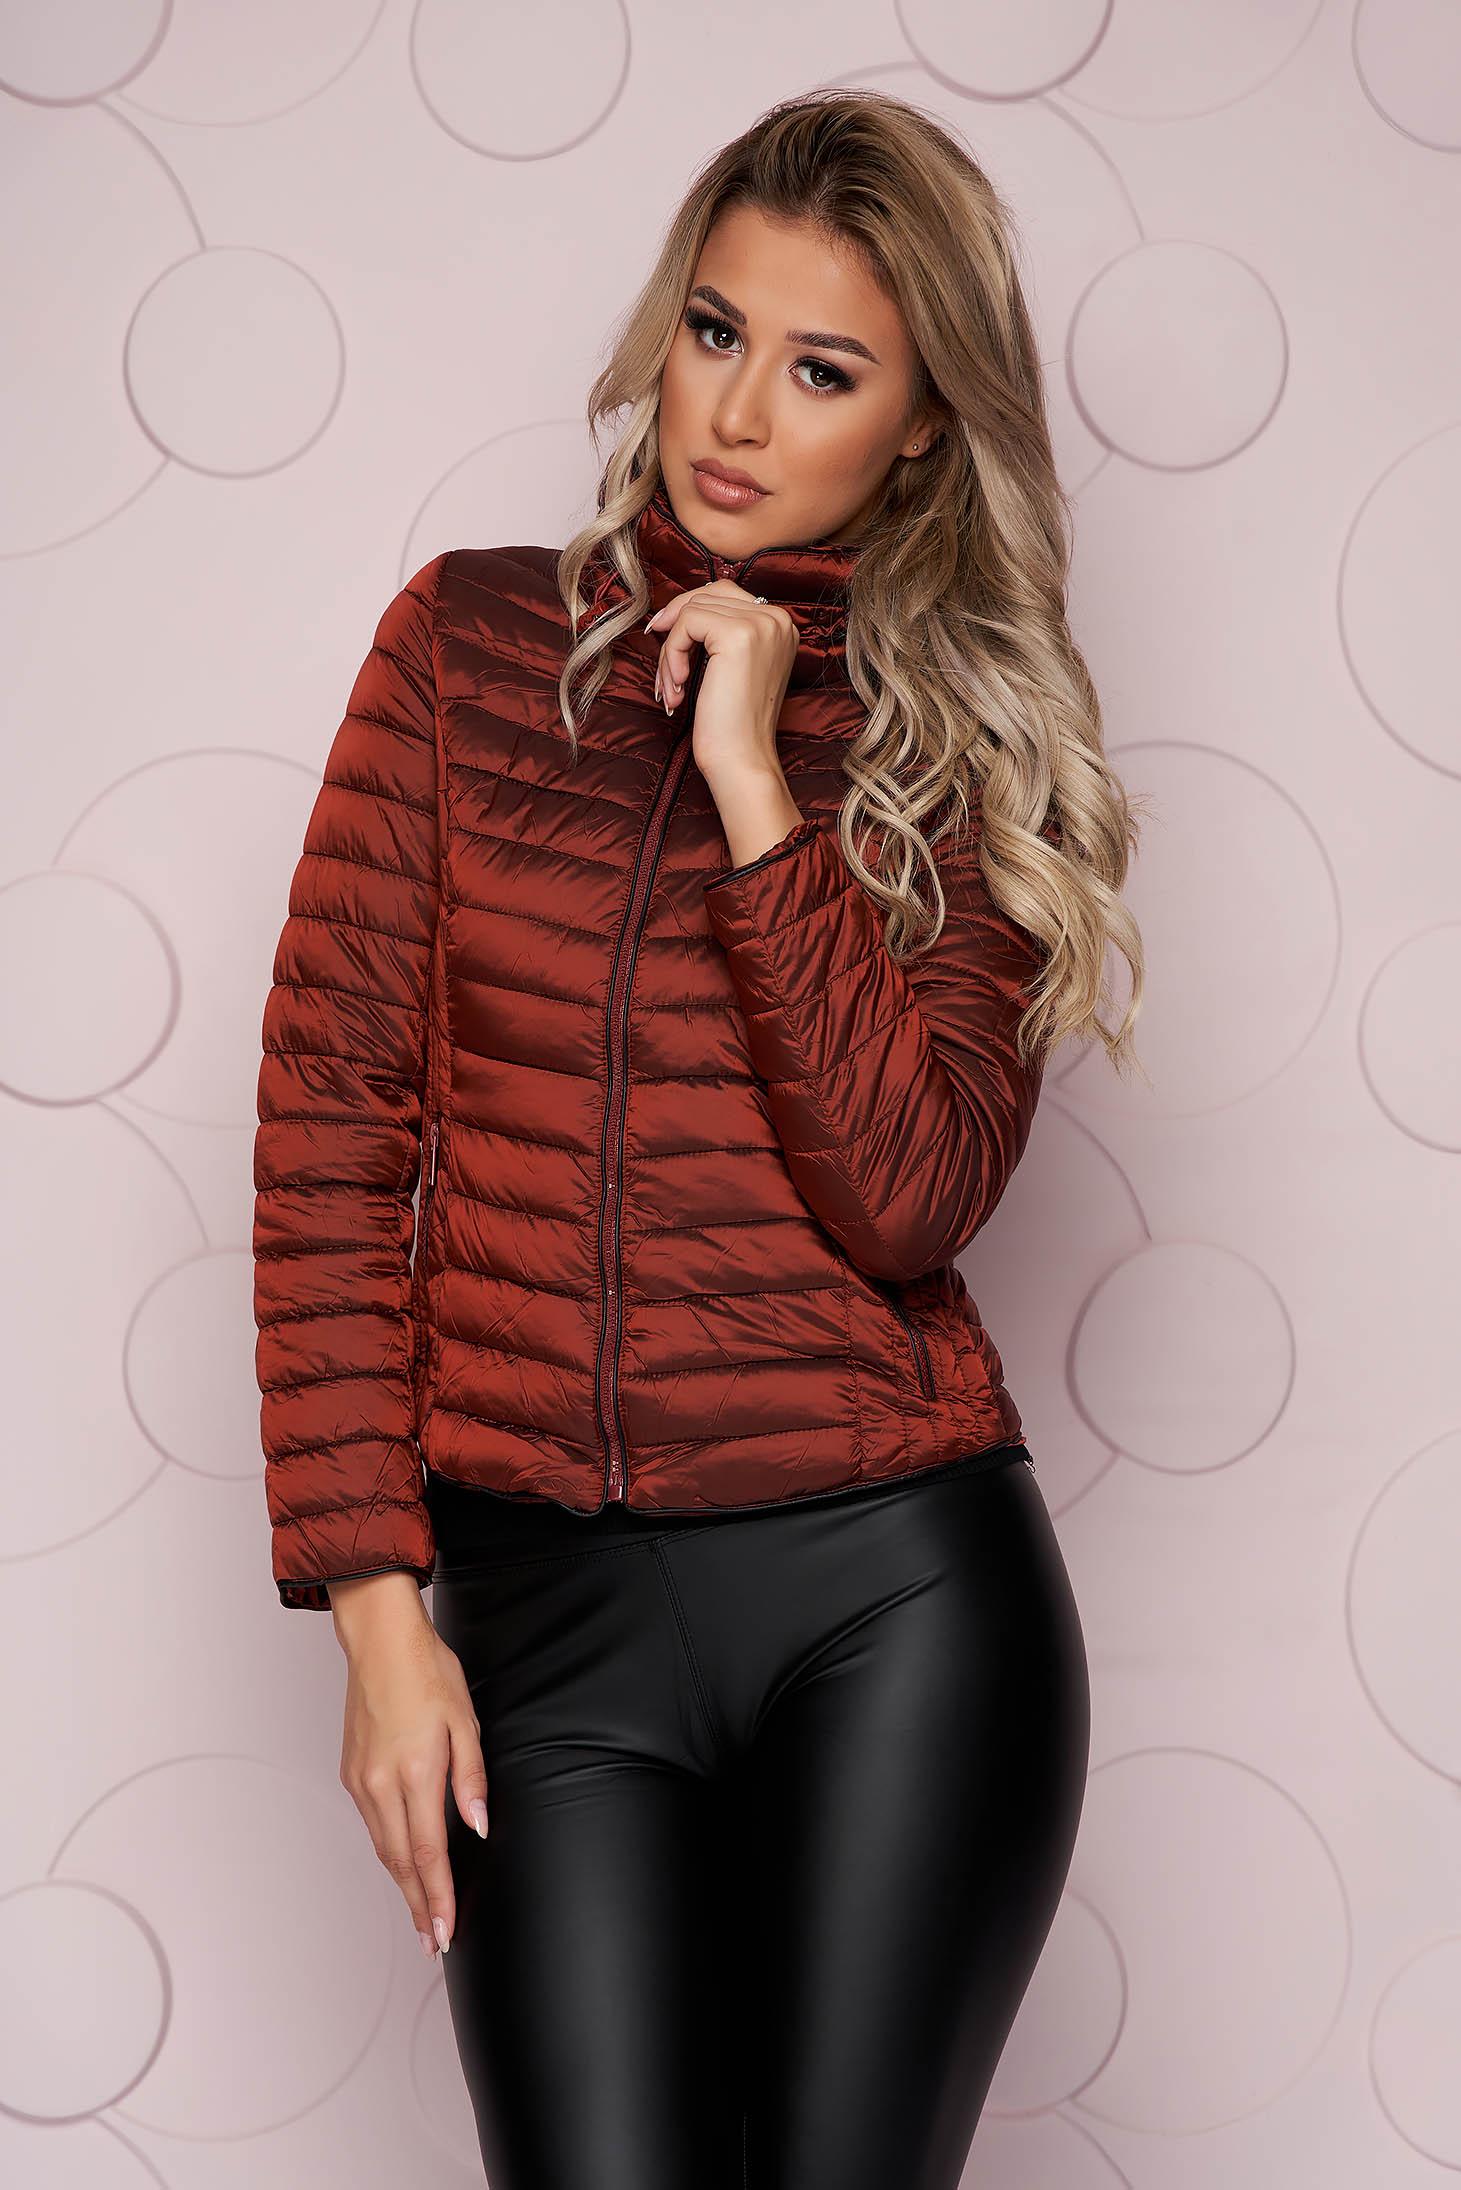 Burgundy jacket tented short cut from slicker with zipper details pockets